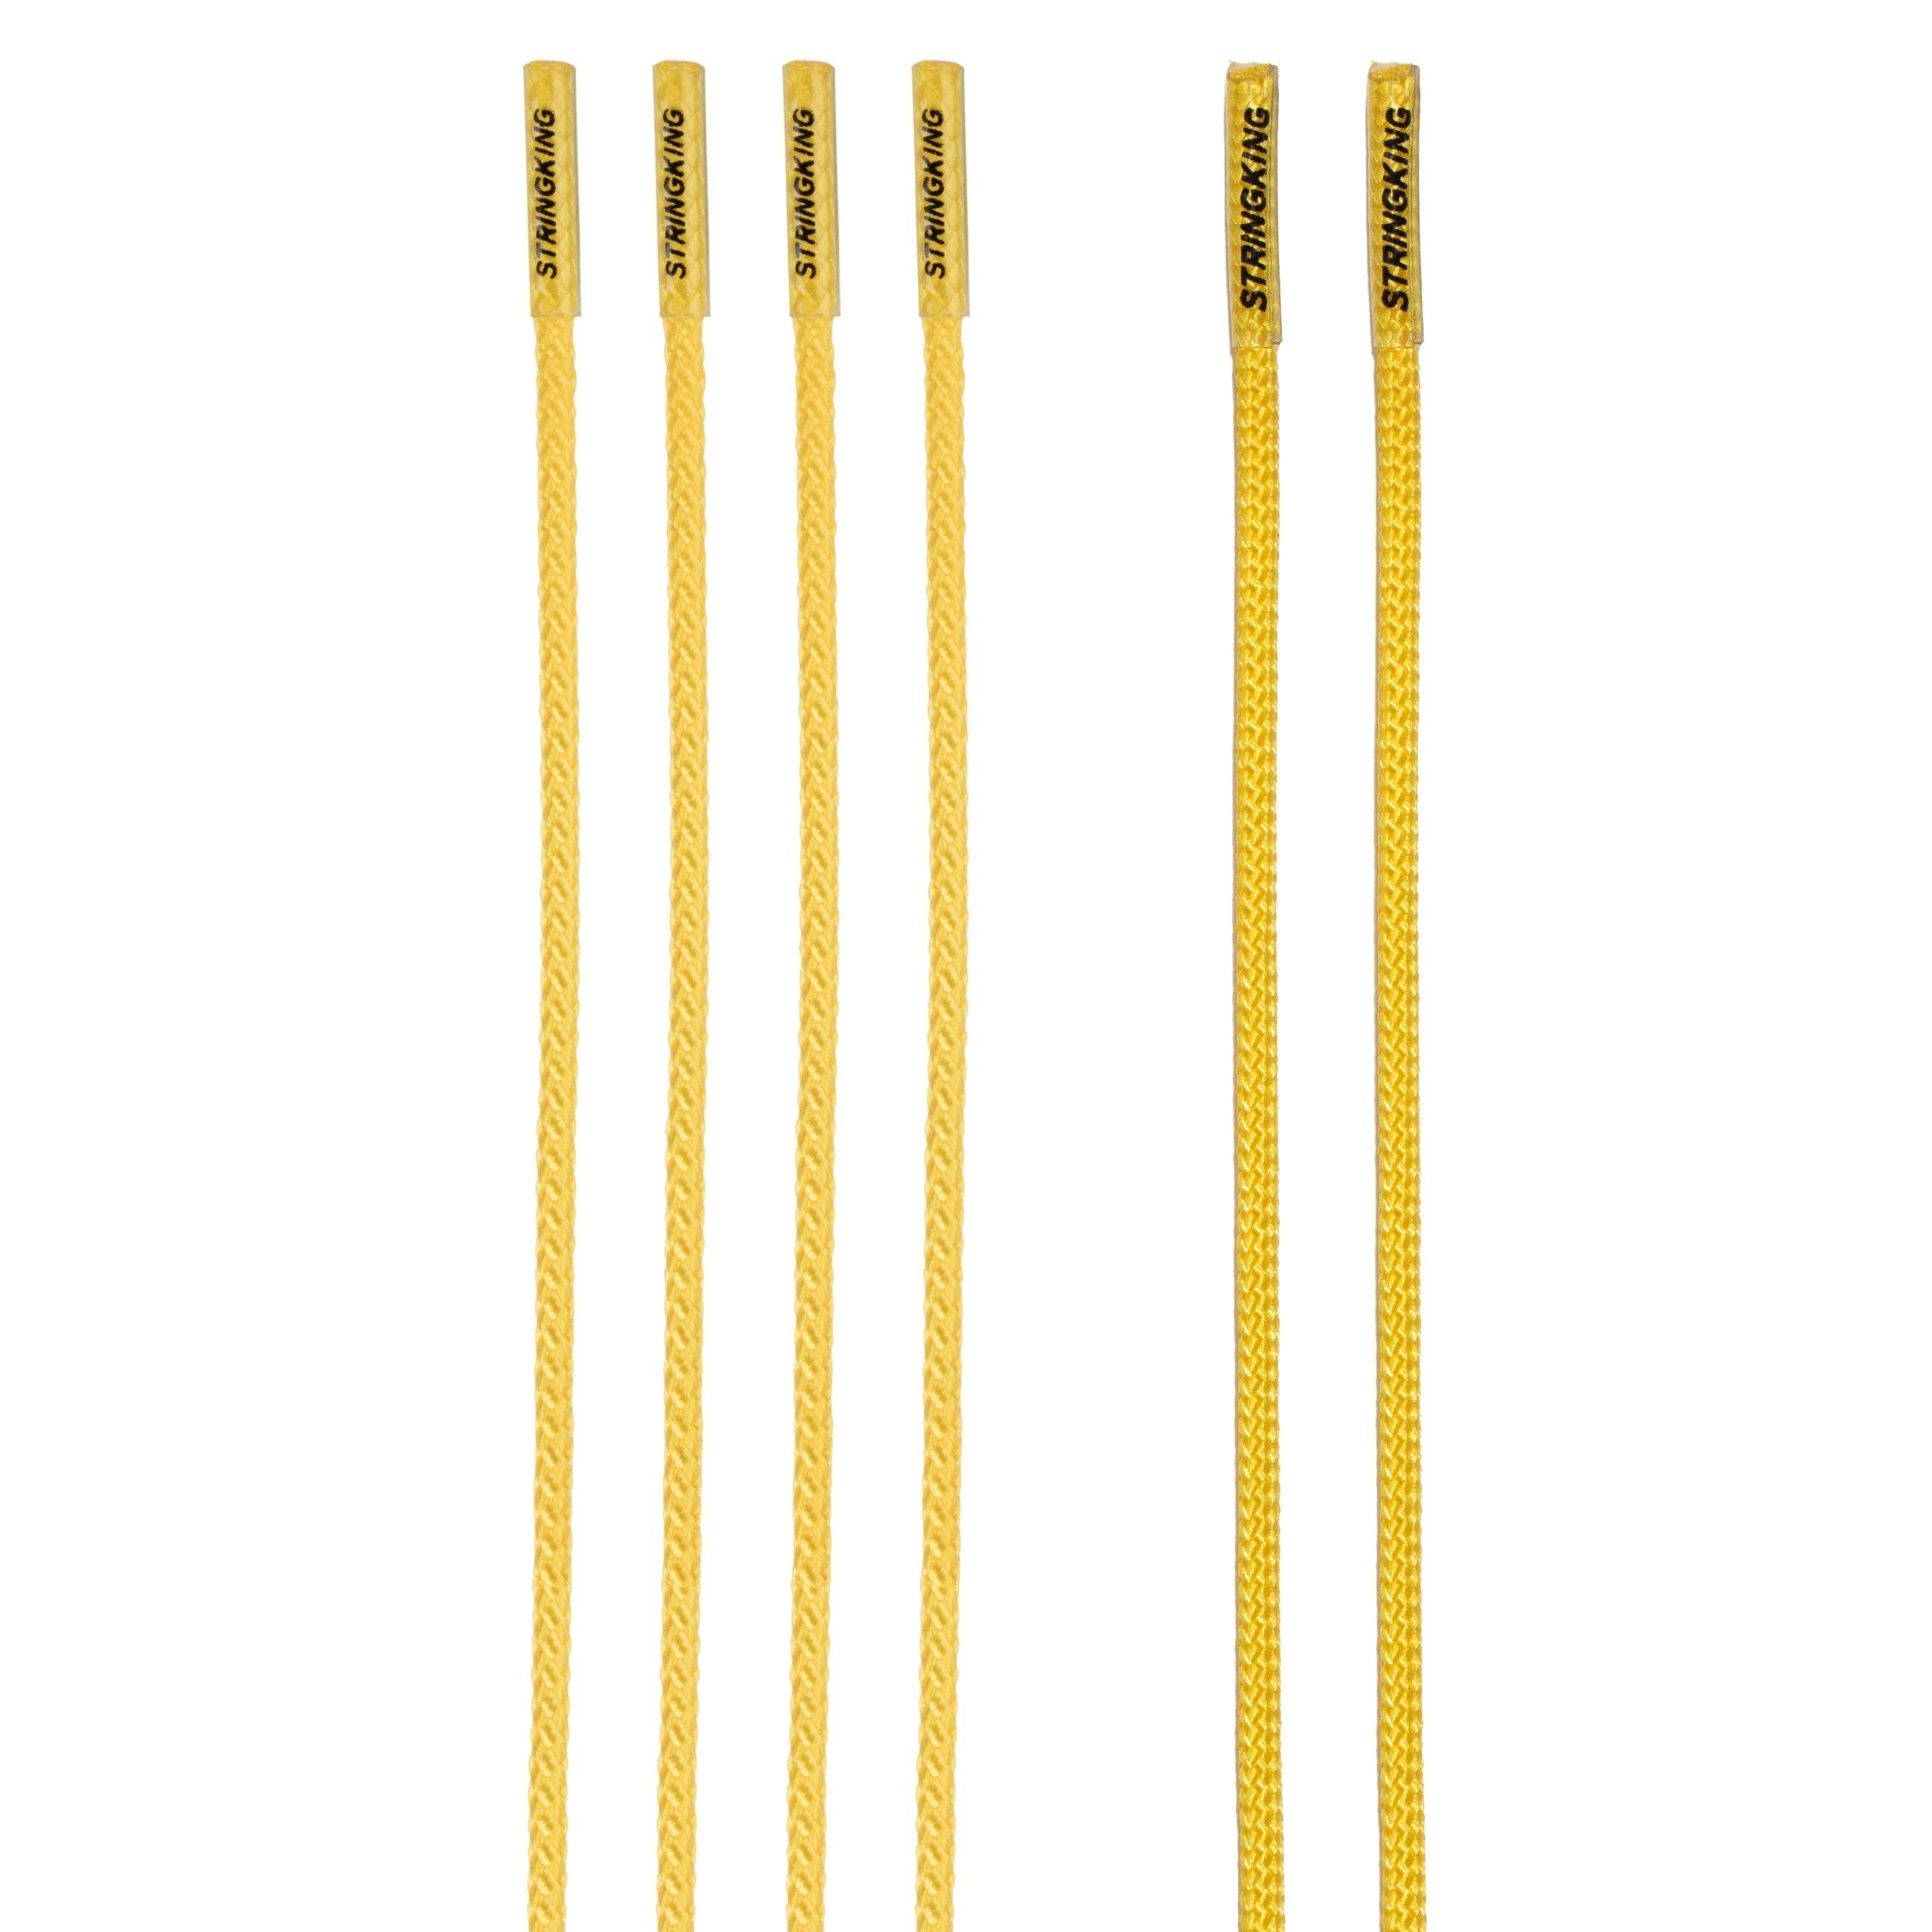 StringKing-Womens-String-Kit-Yellow-scaled-1.jpg